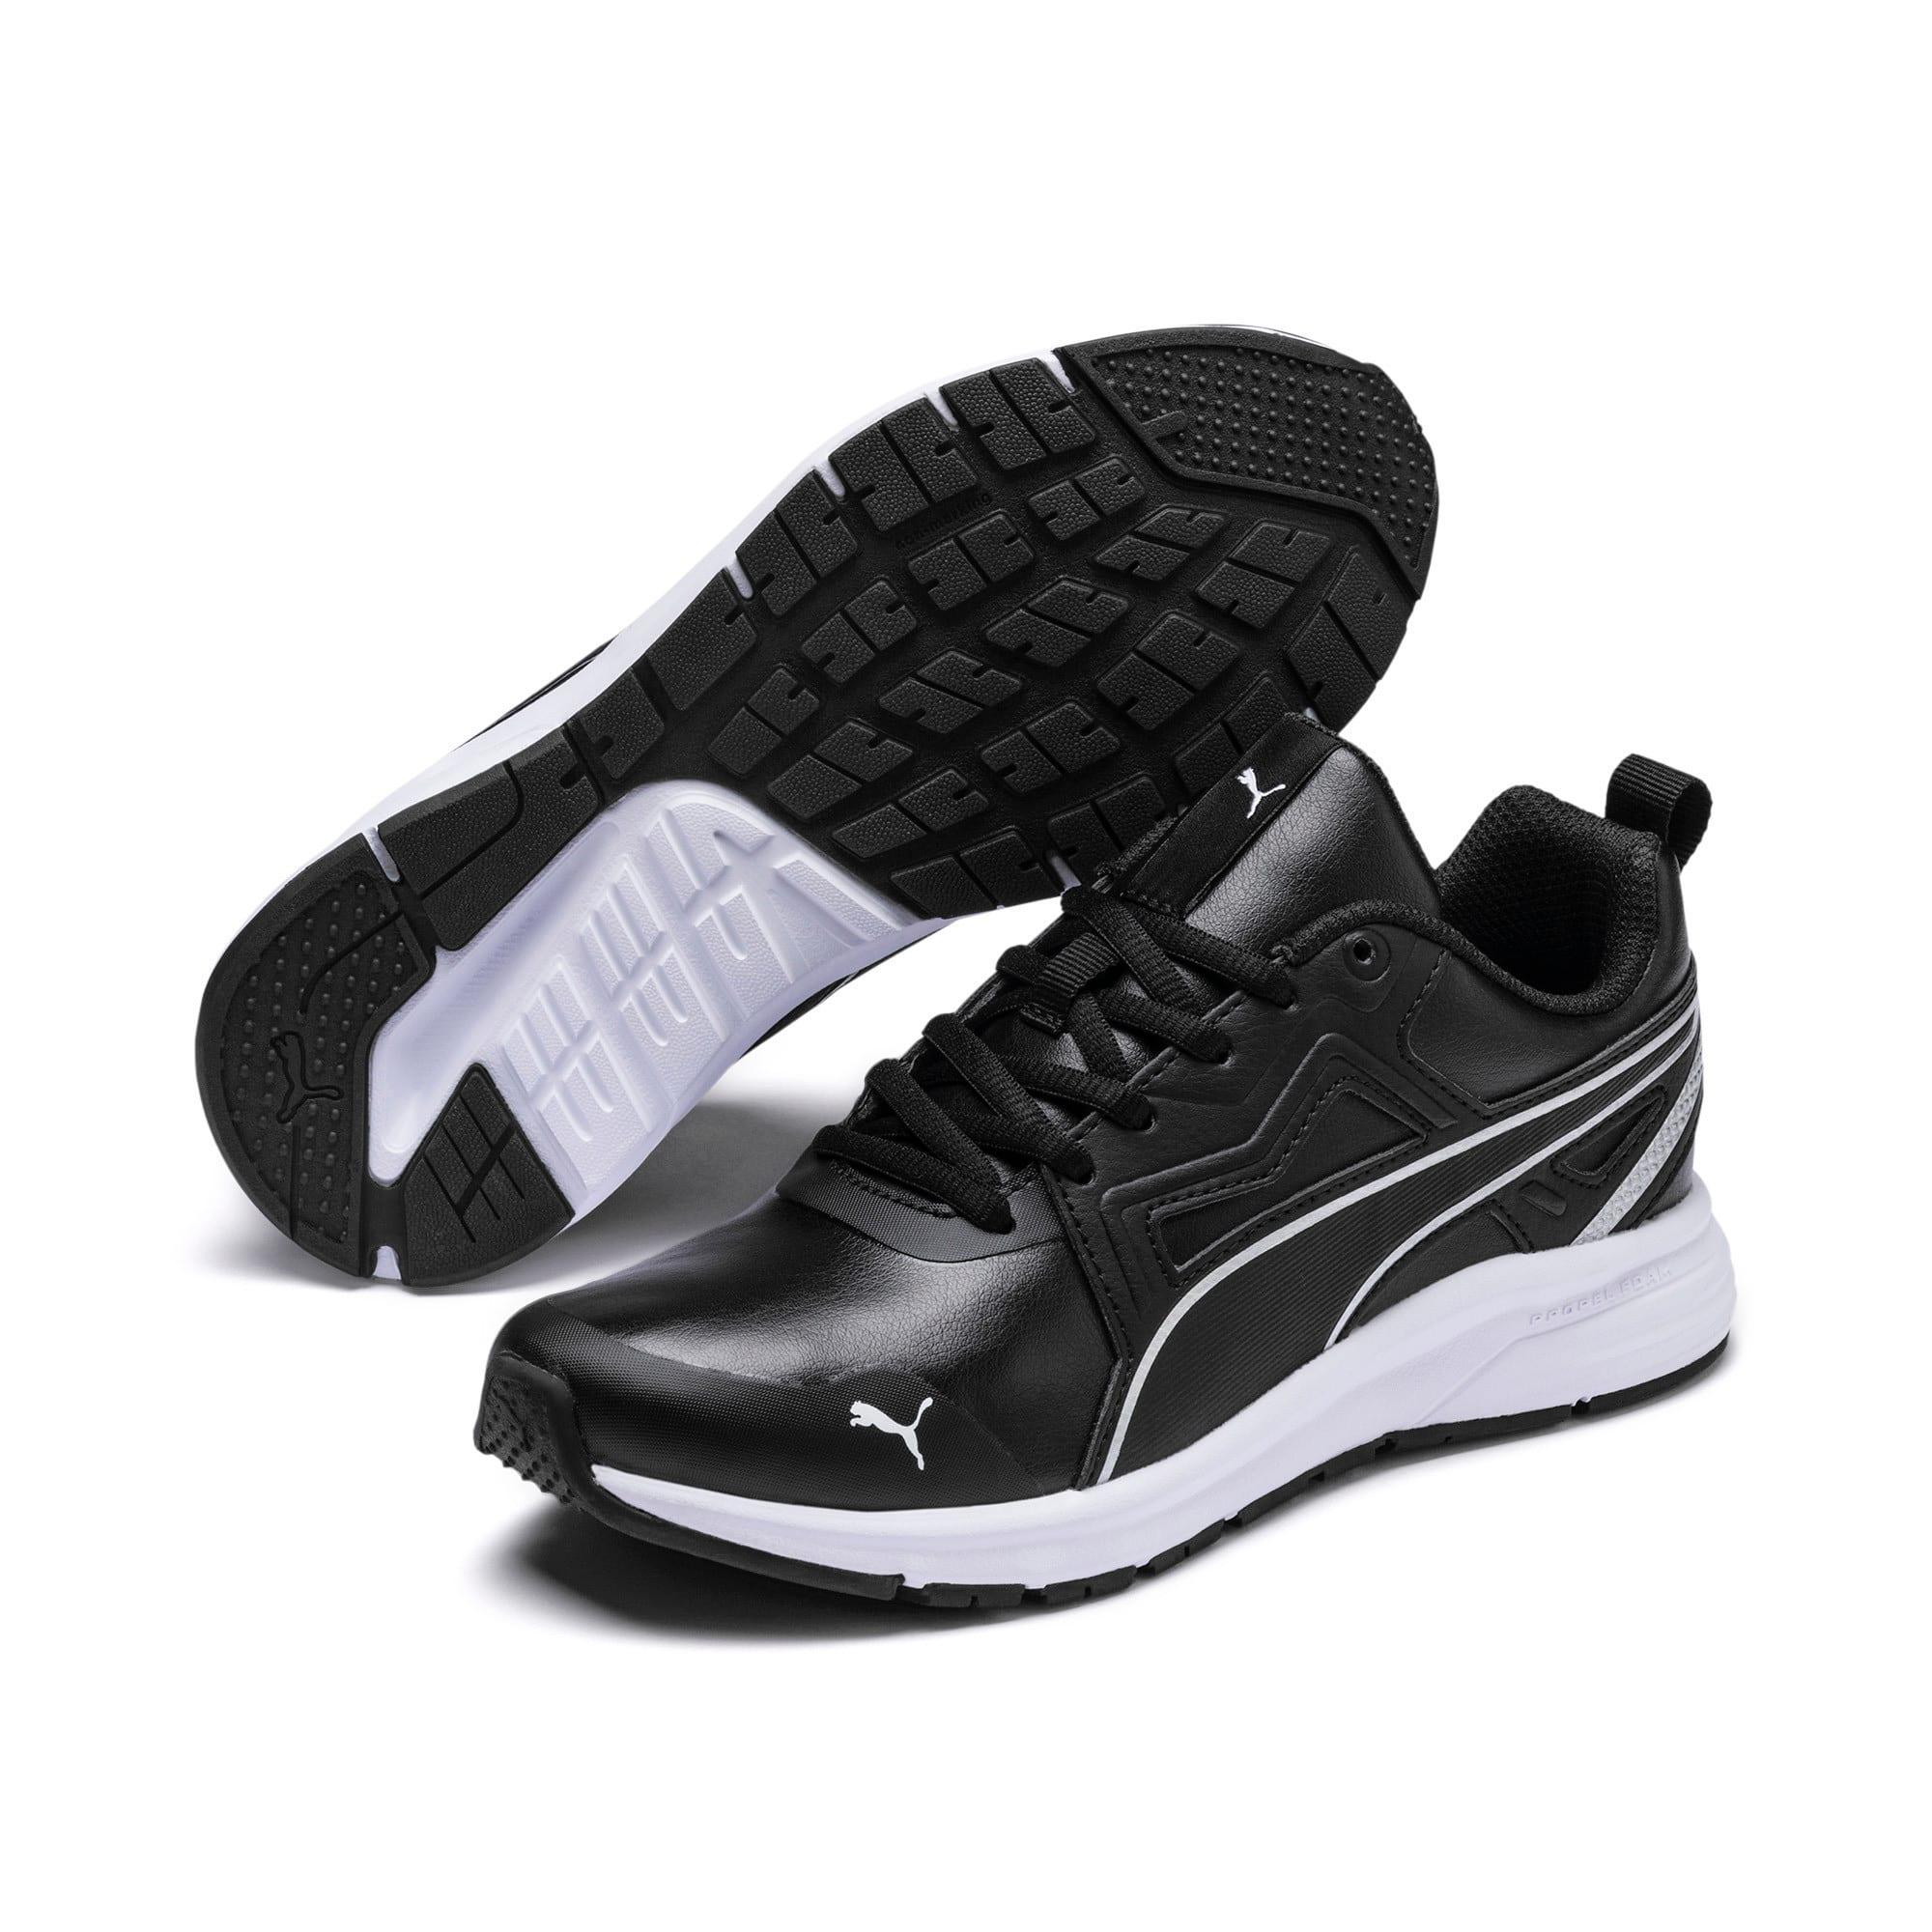 Thumbnail 2 of Pure Jogger SL Sneakers JR, Puma Black-Puma Silver-White, medium